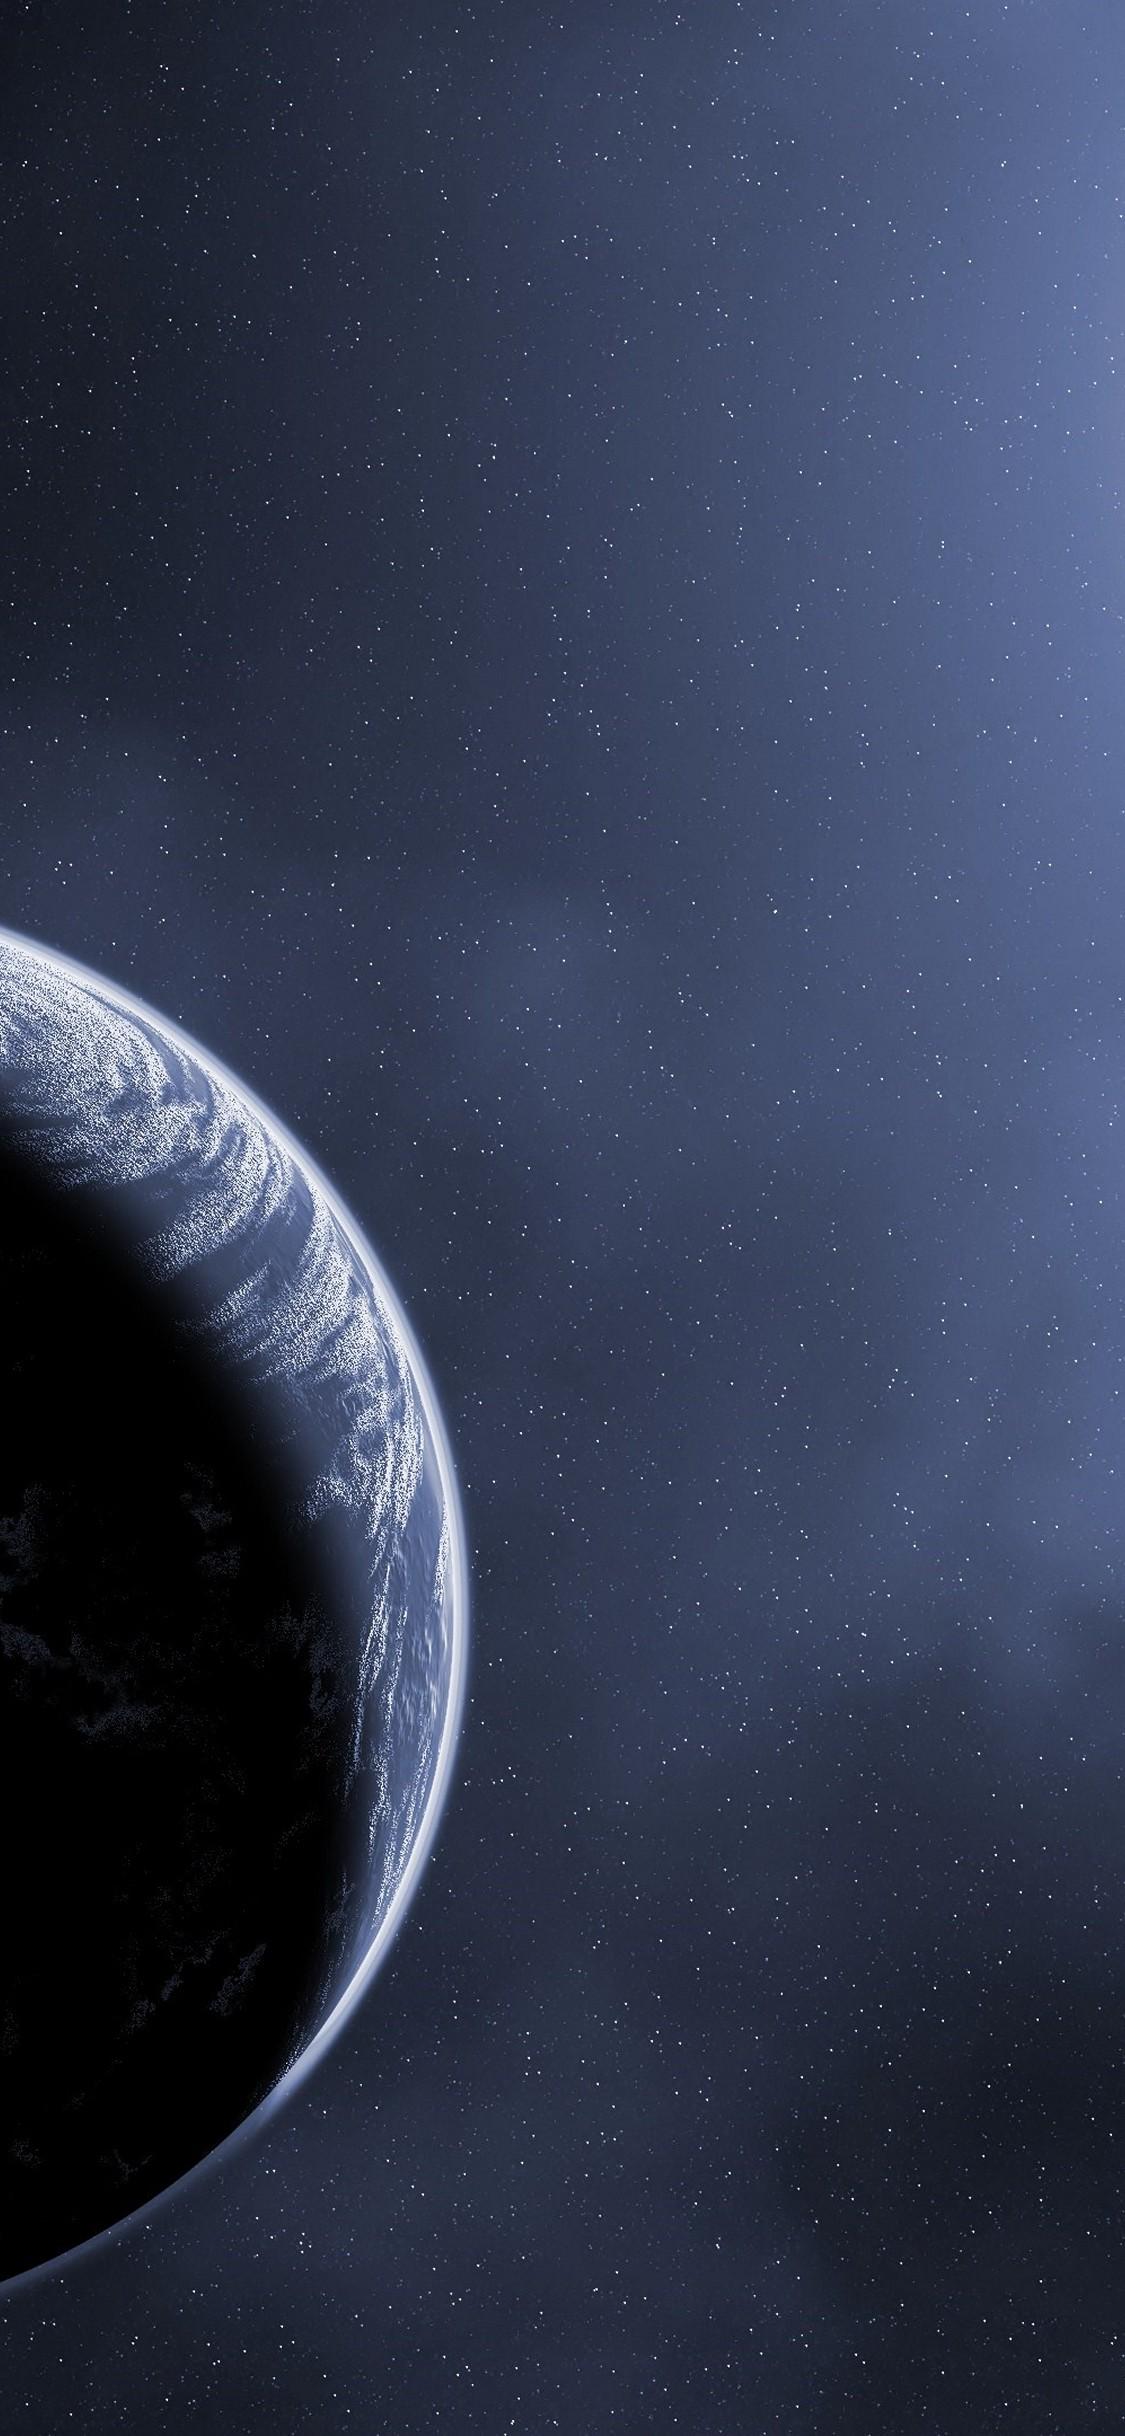 Scientific Planet Galaxy Space Stars HD Wallpaper